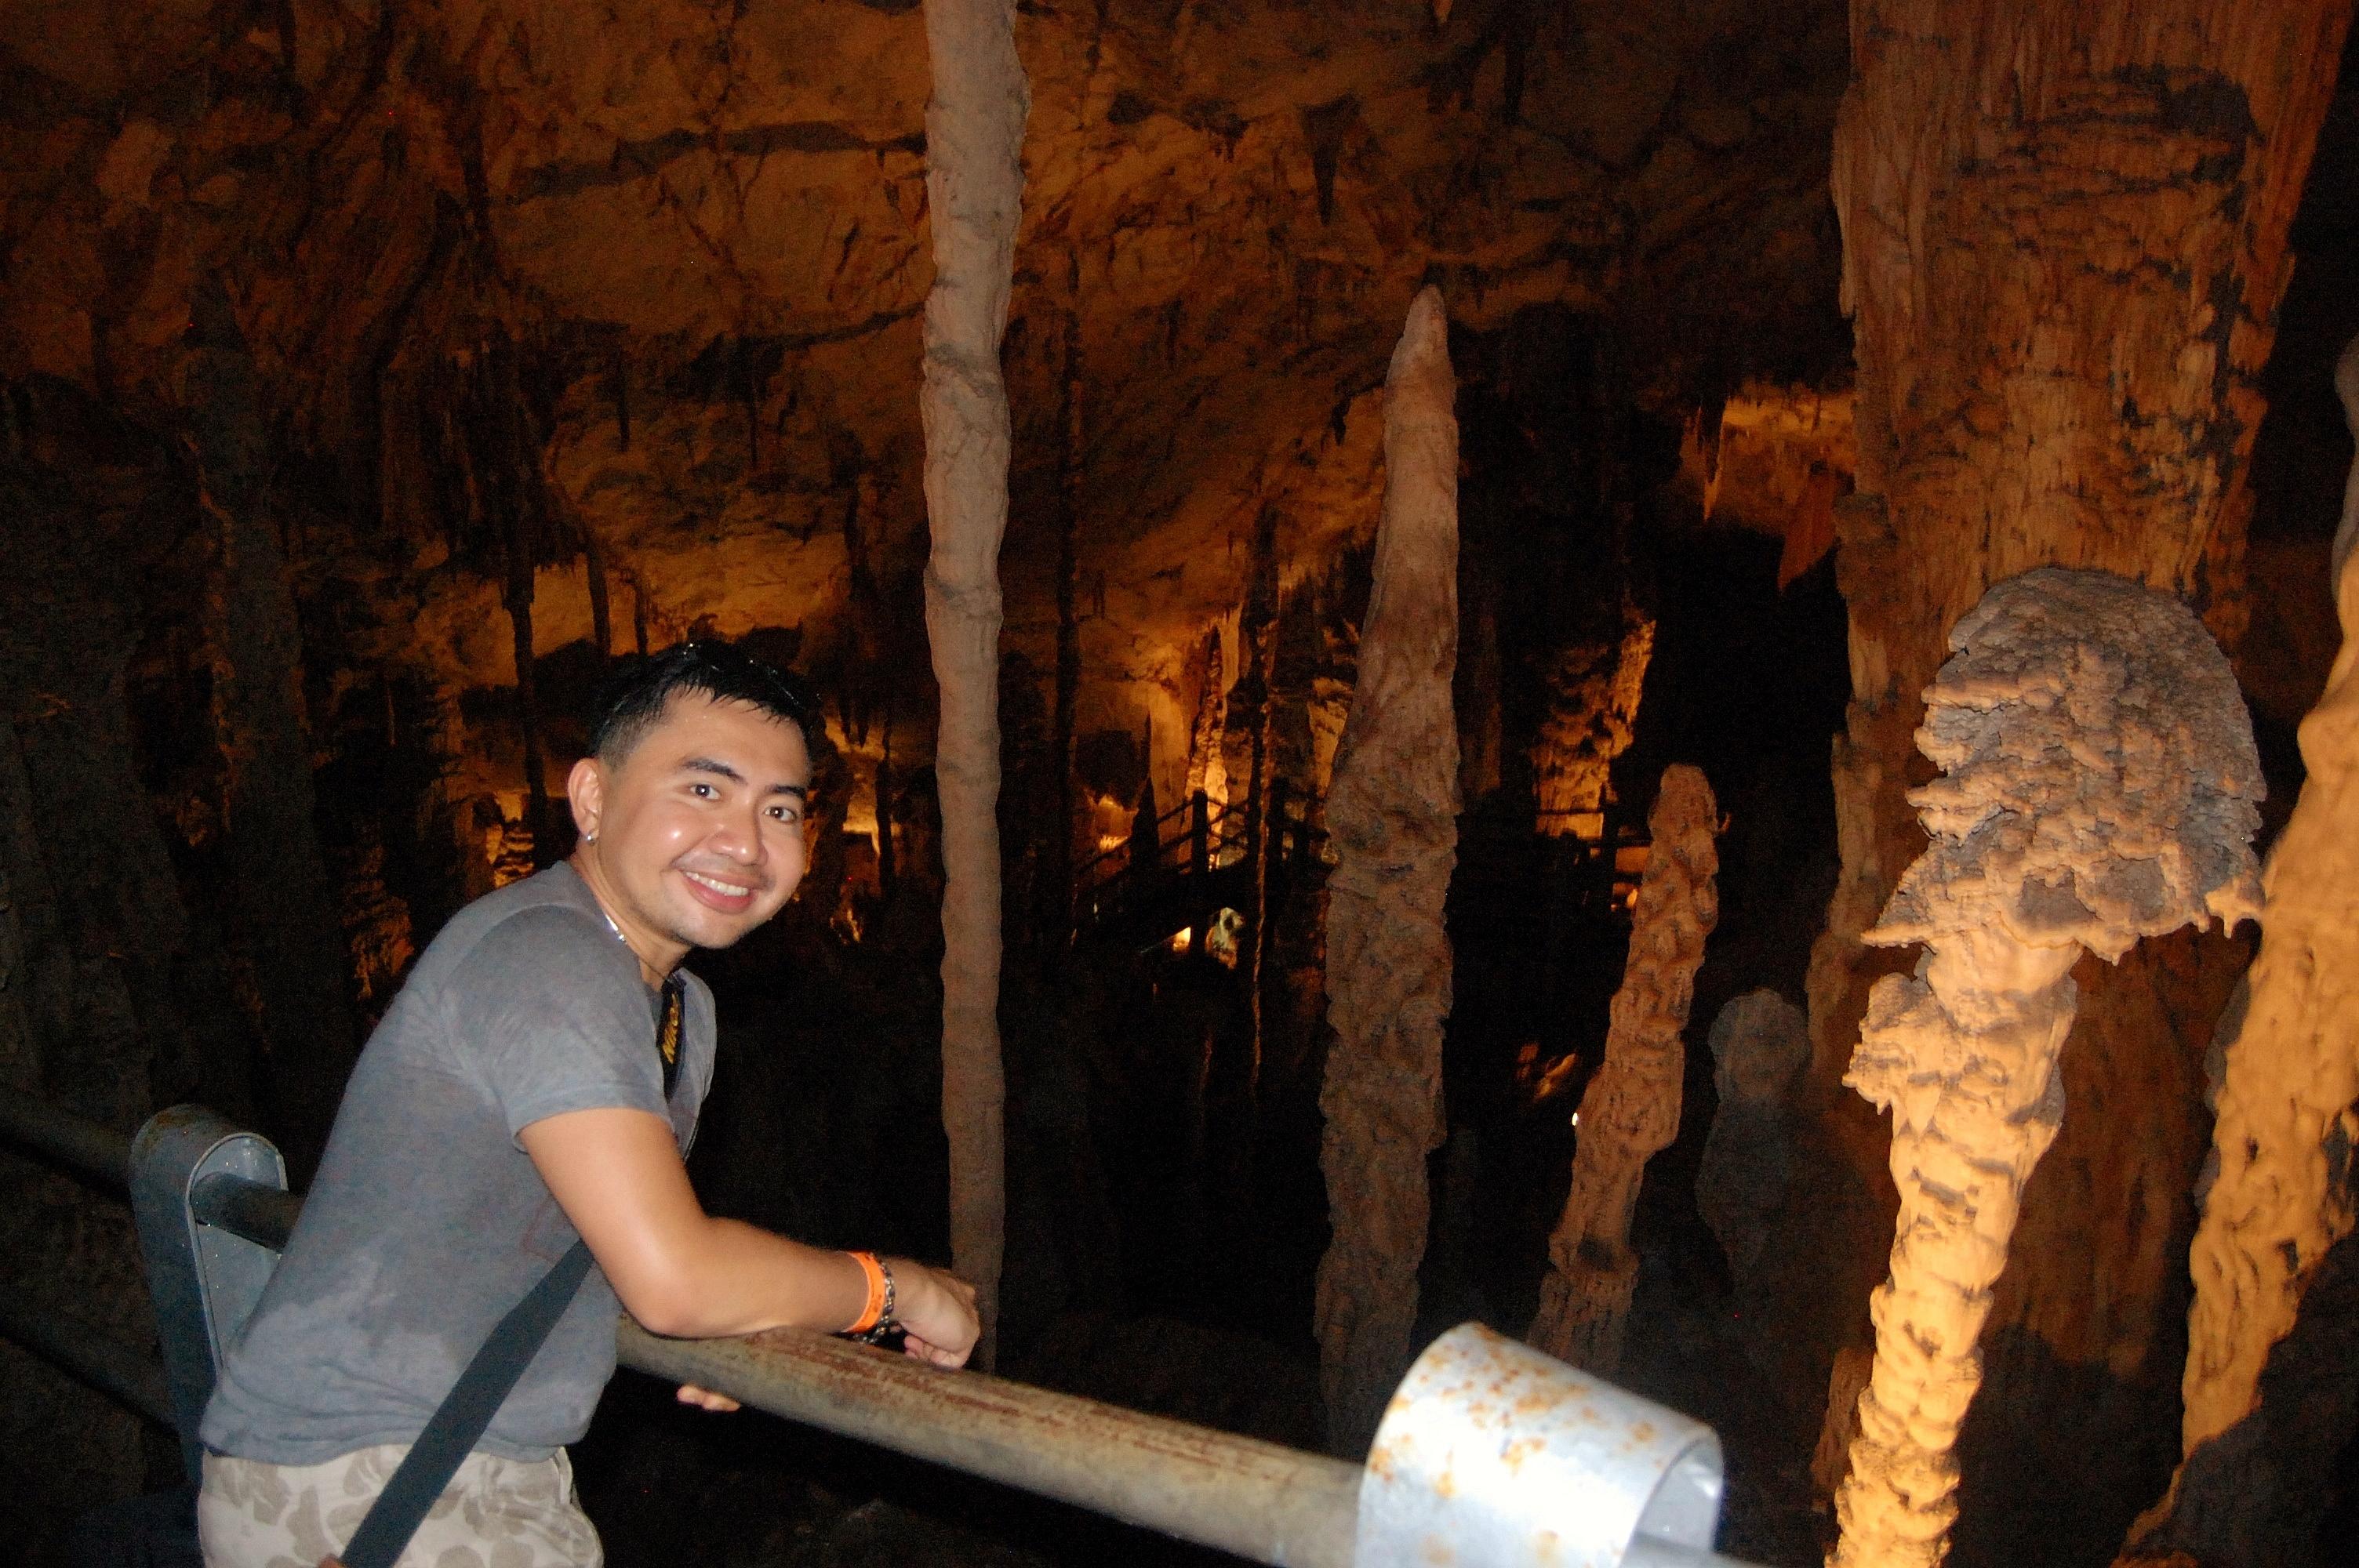 A Courtesy Call inside the King's Chamber Gunung Mulu National Park - Malaysia Bernard Joseph Esposo Guerrero